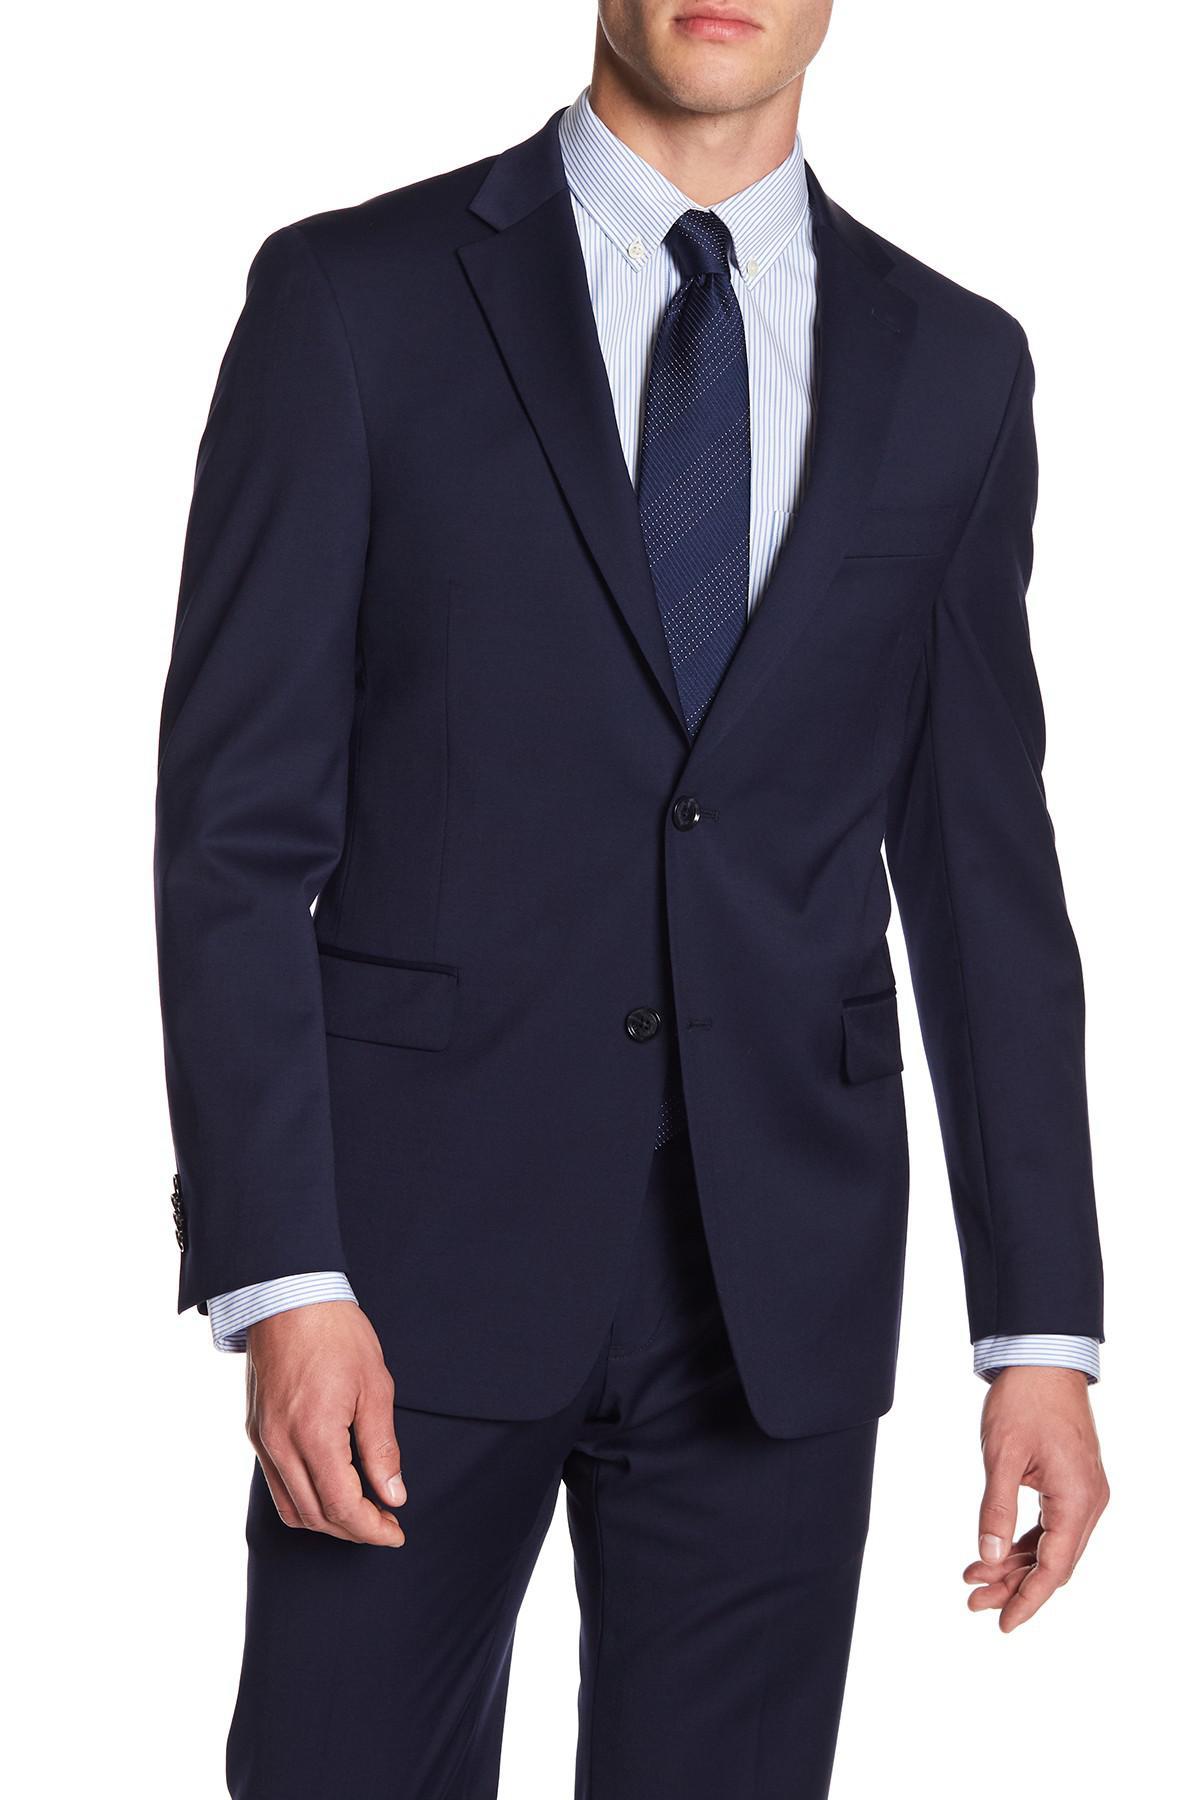 132b147ccdb ... Fit Th Flex Performance Wool Blend Suit Separates Jacket for. View  fullscreen